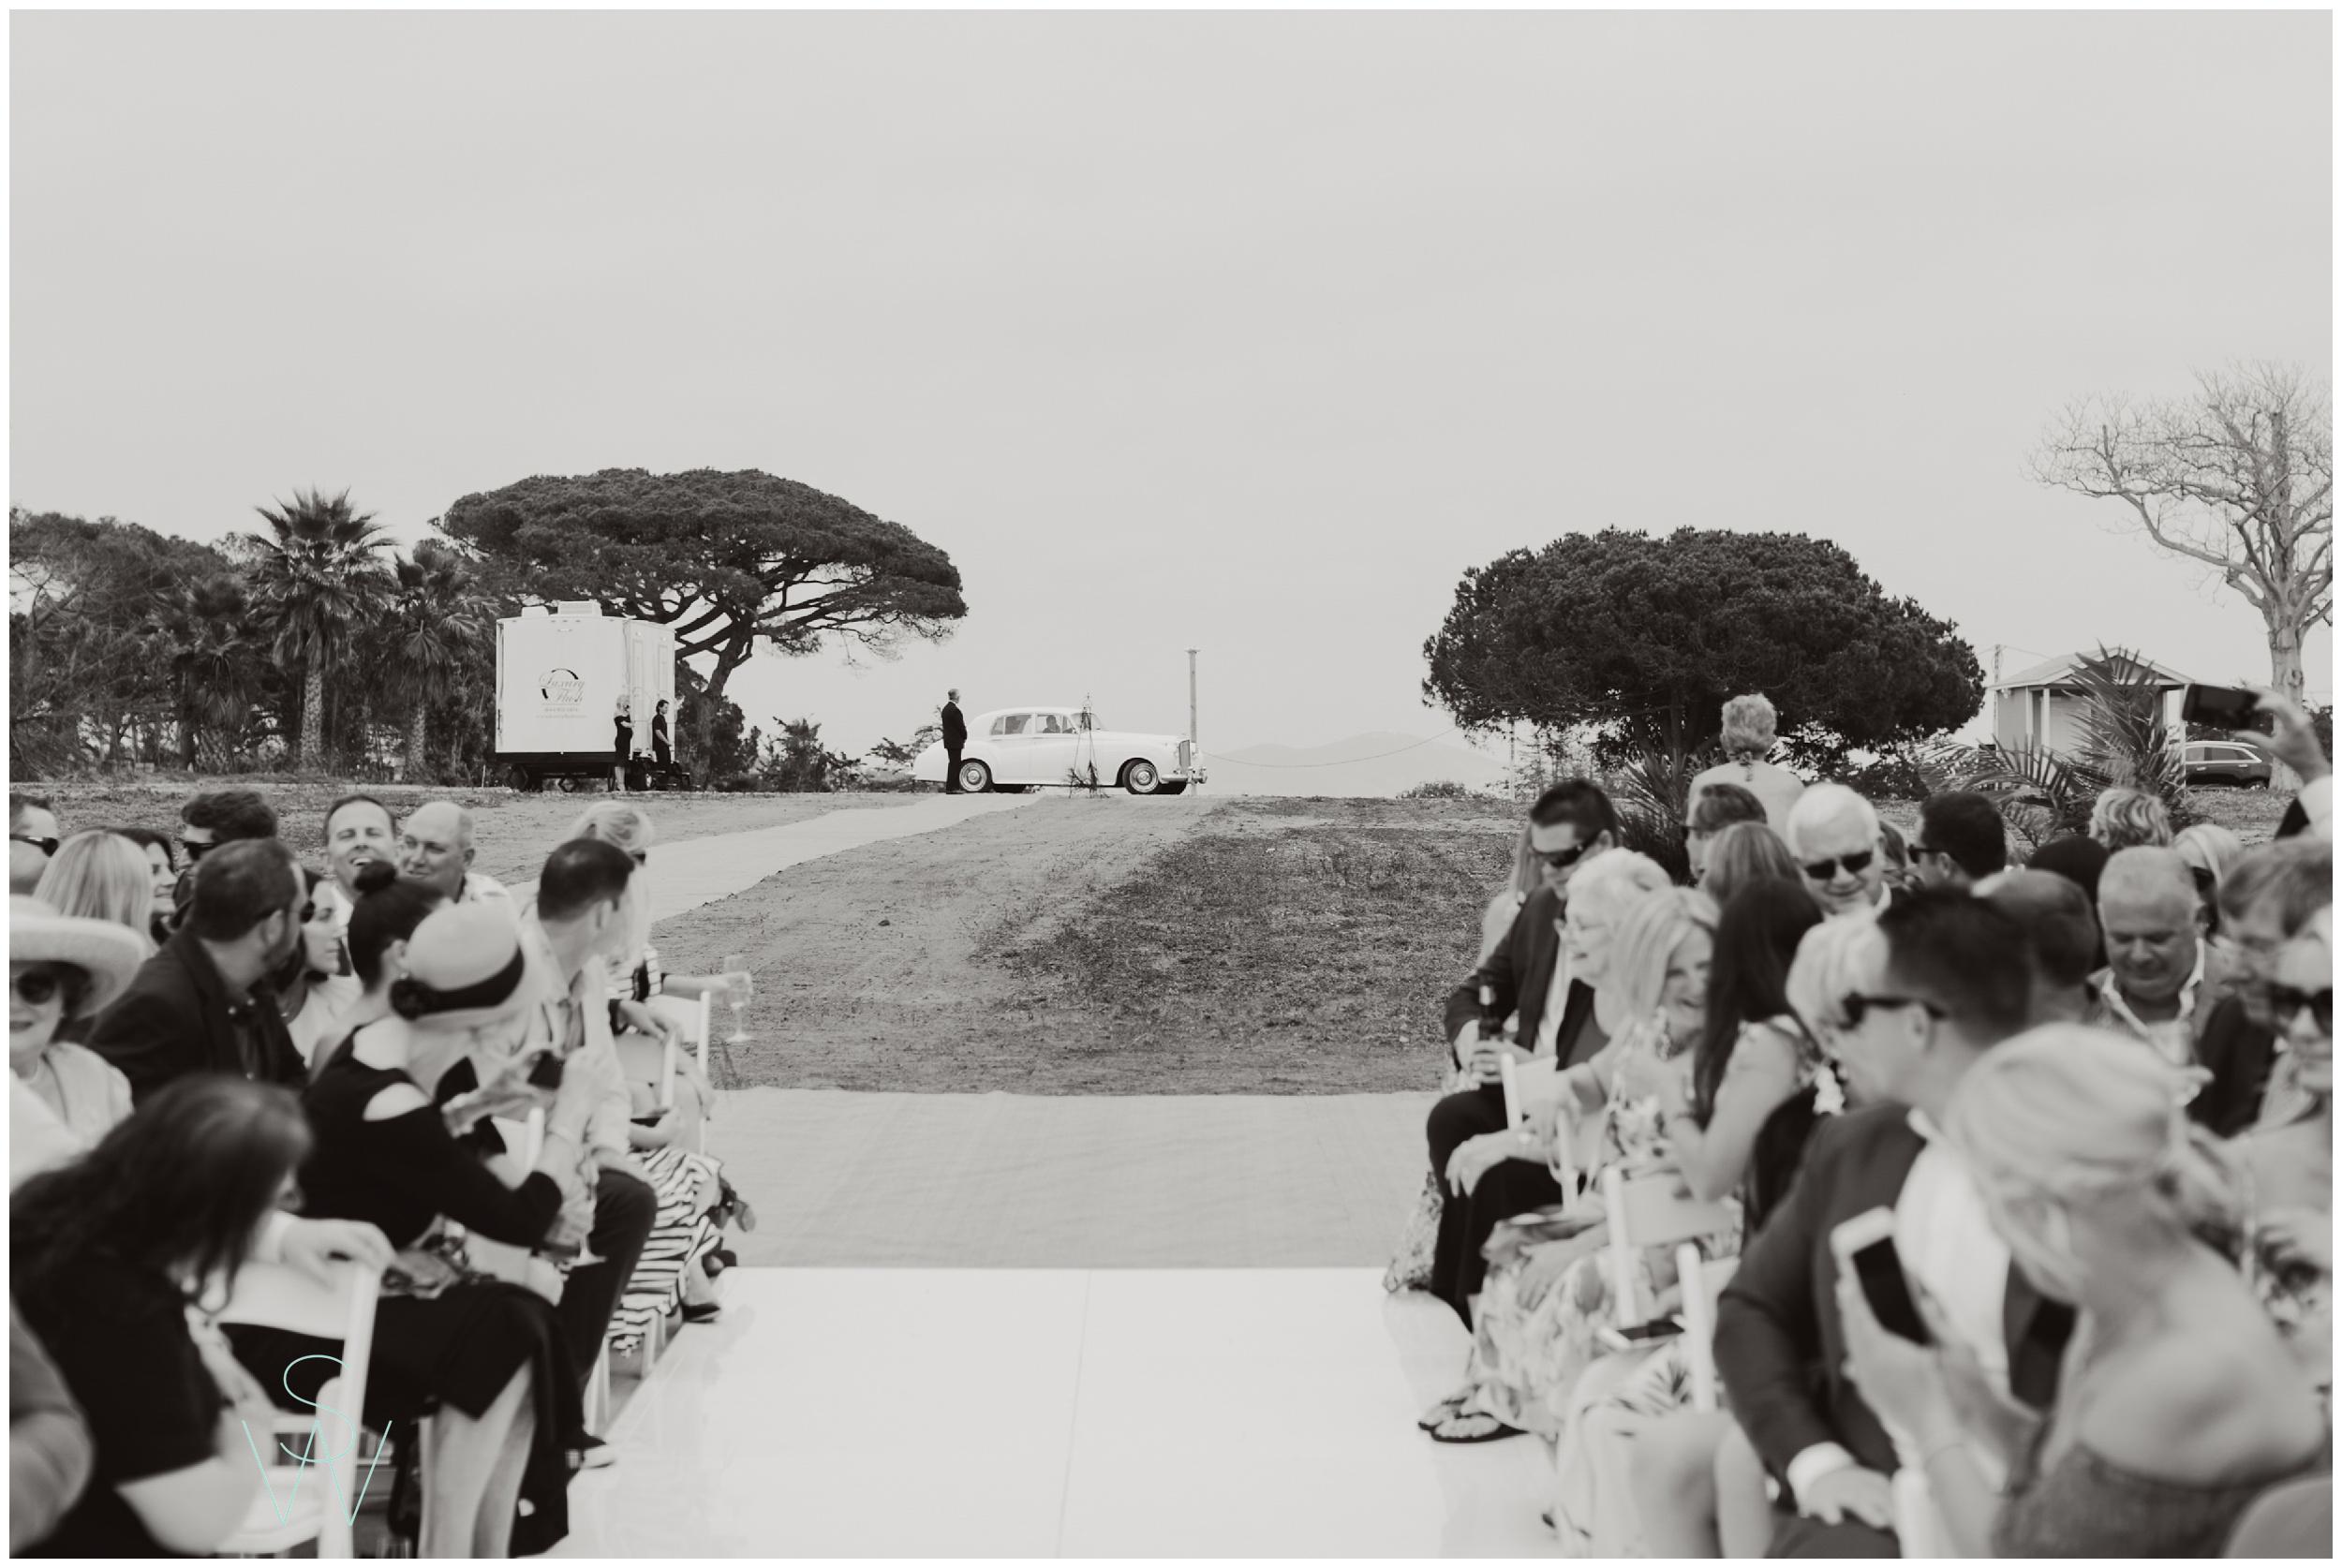 shewanders.san.diego.wedding.brigatine.isari-119.jpg